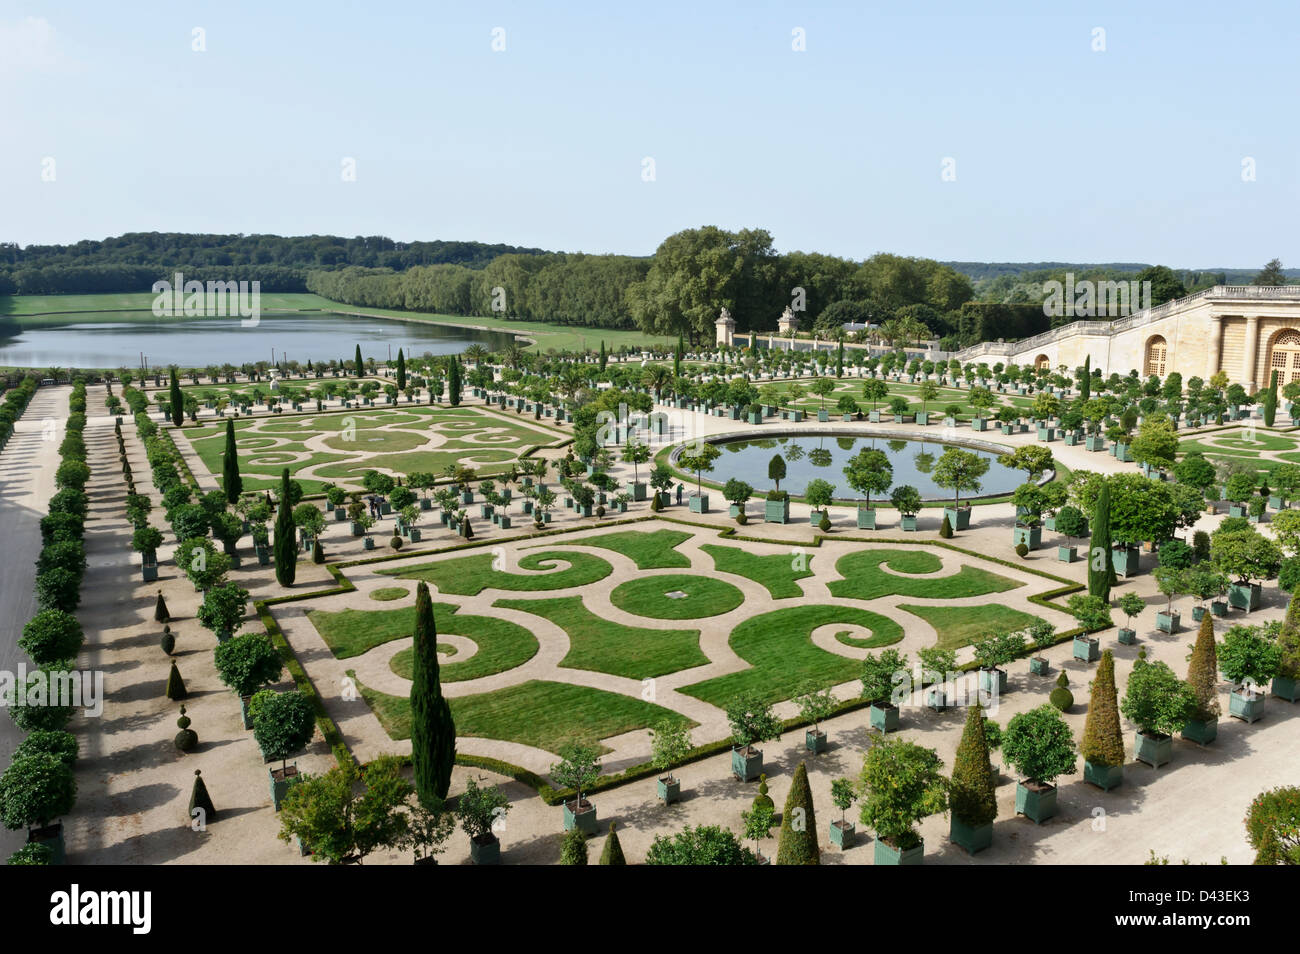 Giardini di versailles chateau de versailles francia foto